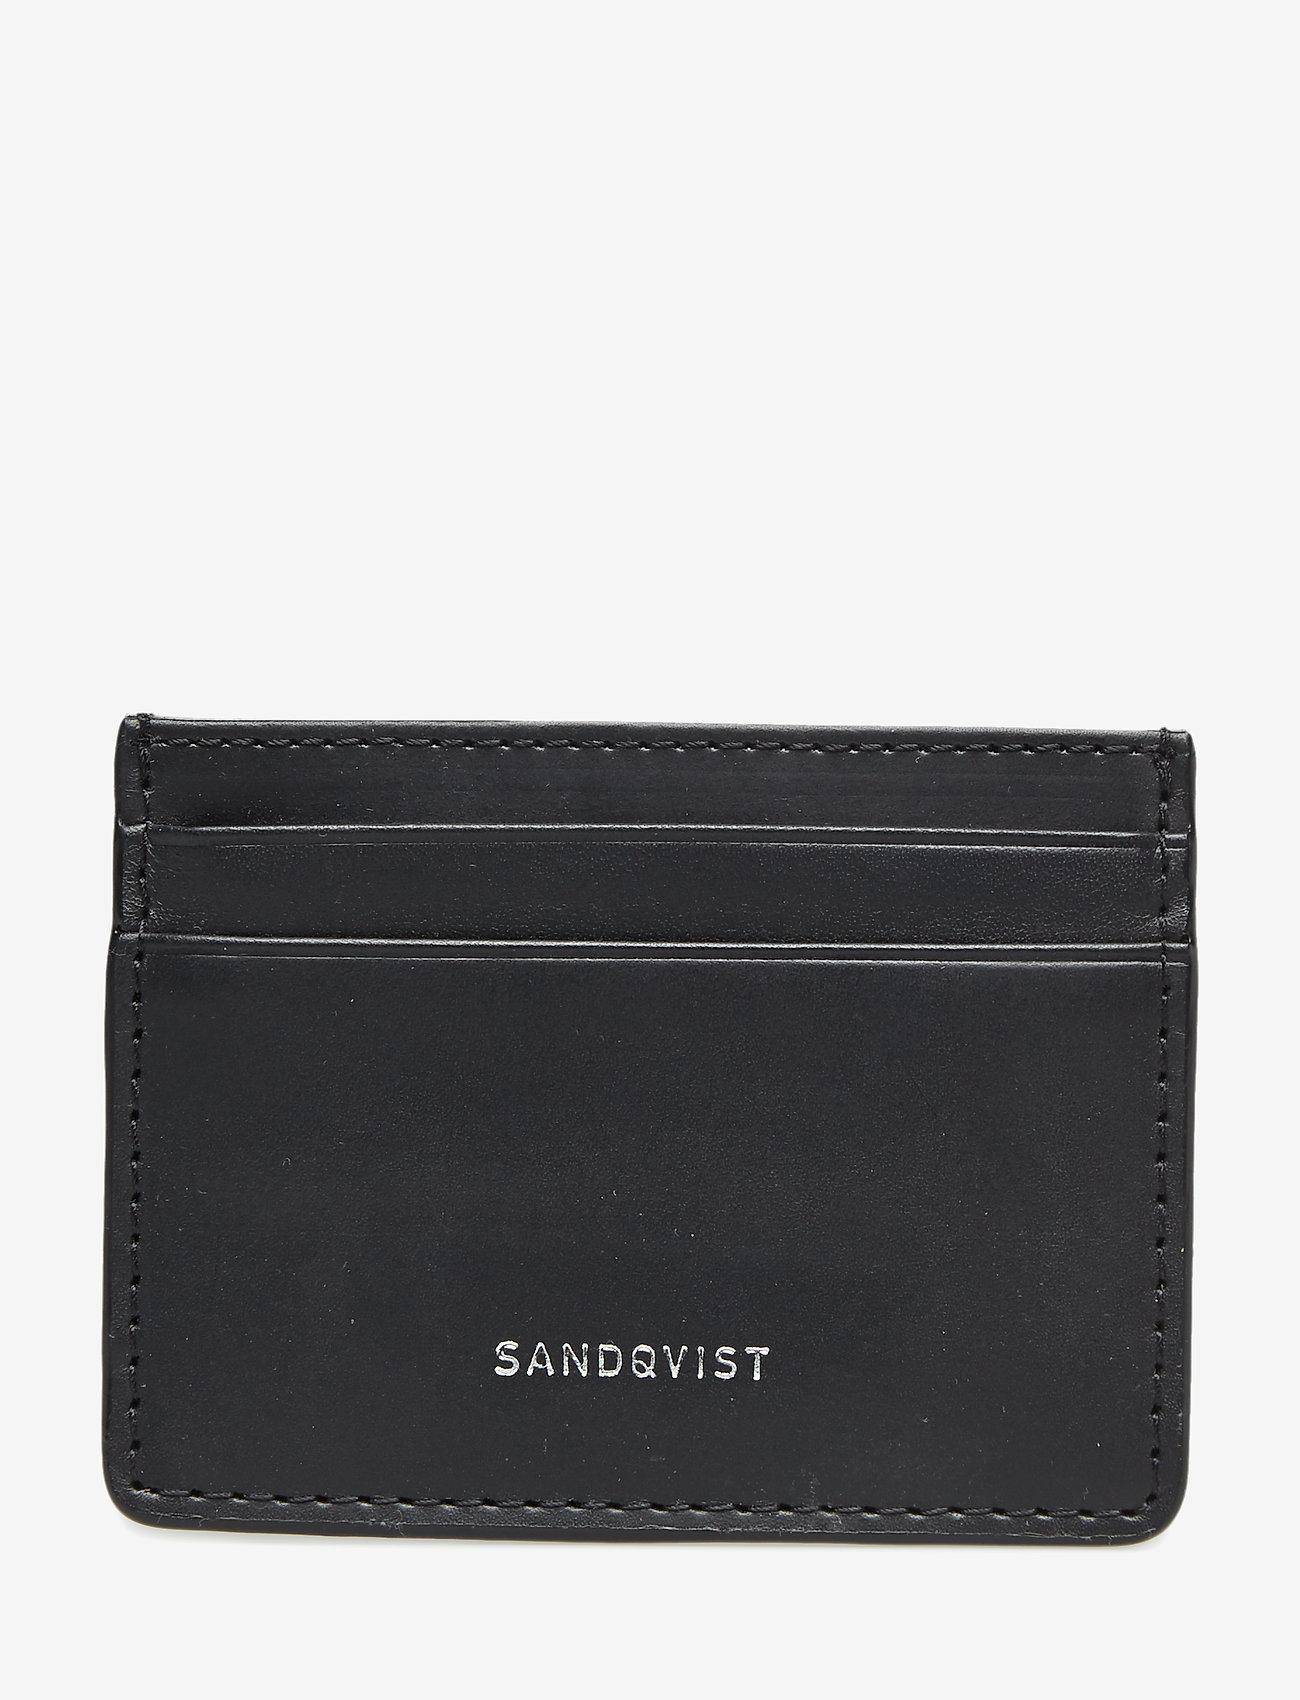 SANDQVIST - FRED - wallets & cases - black - 1